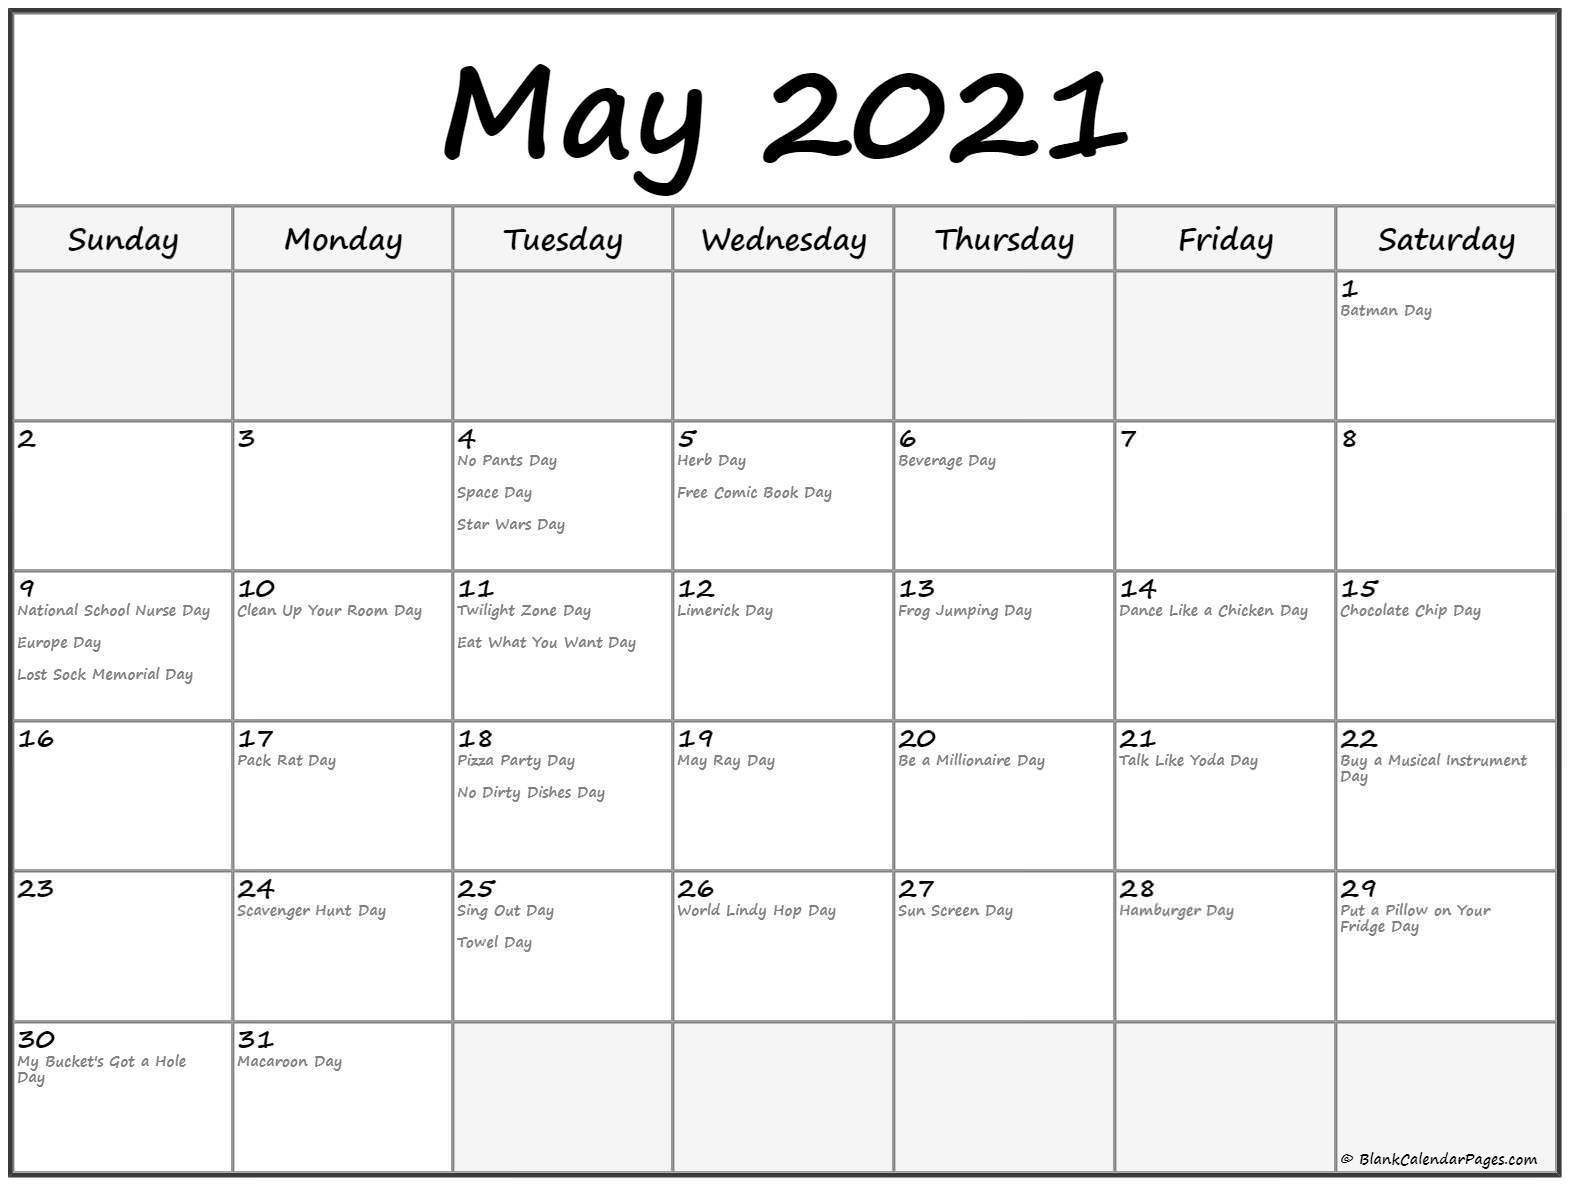 May 2021 National Calendar   Printable March-Printable List Of 2021 National Days